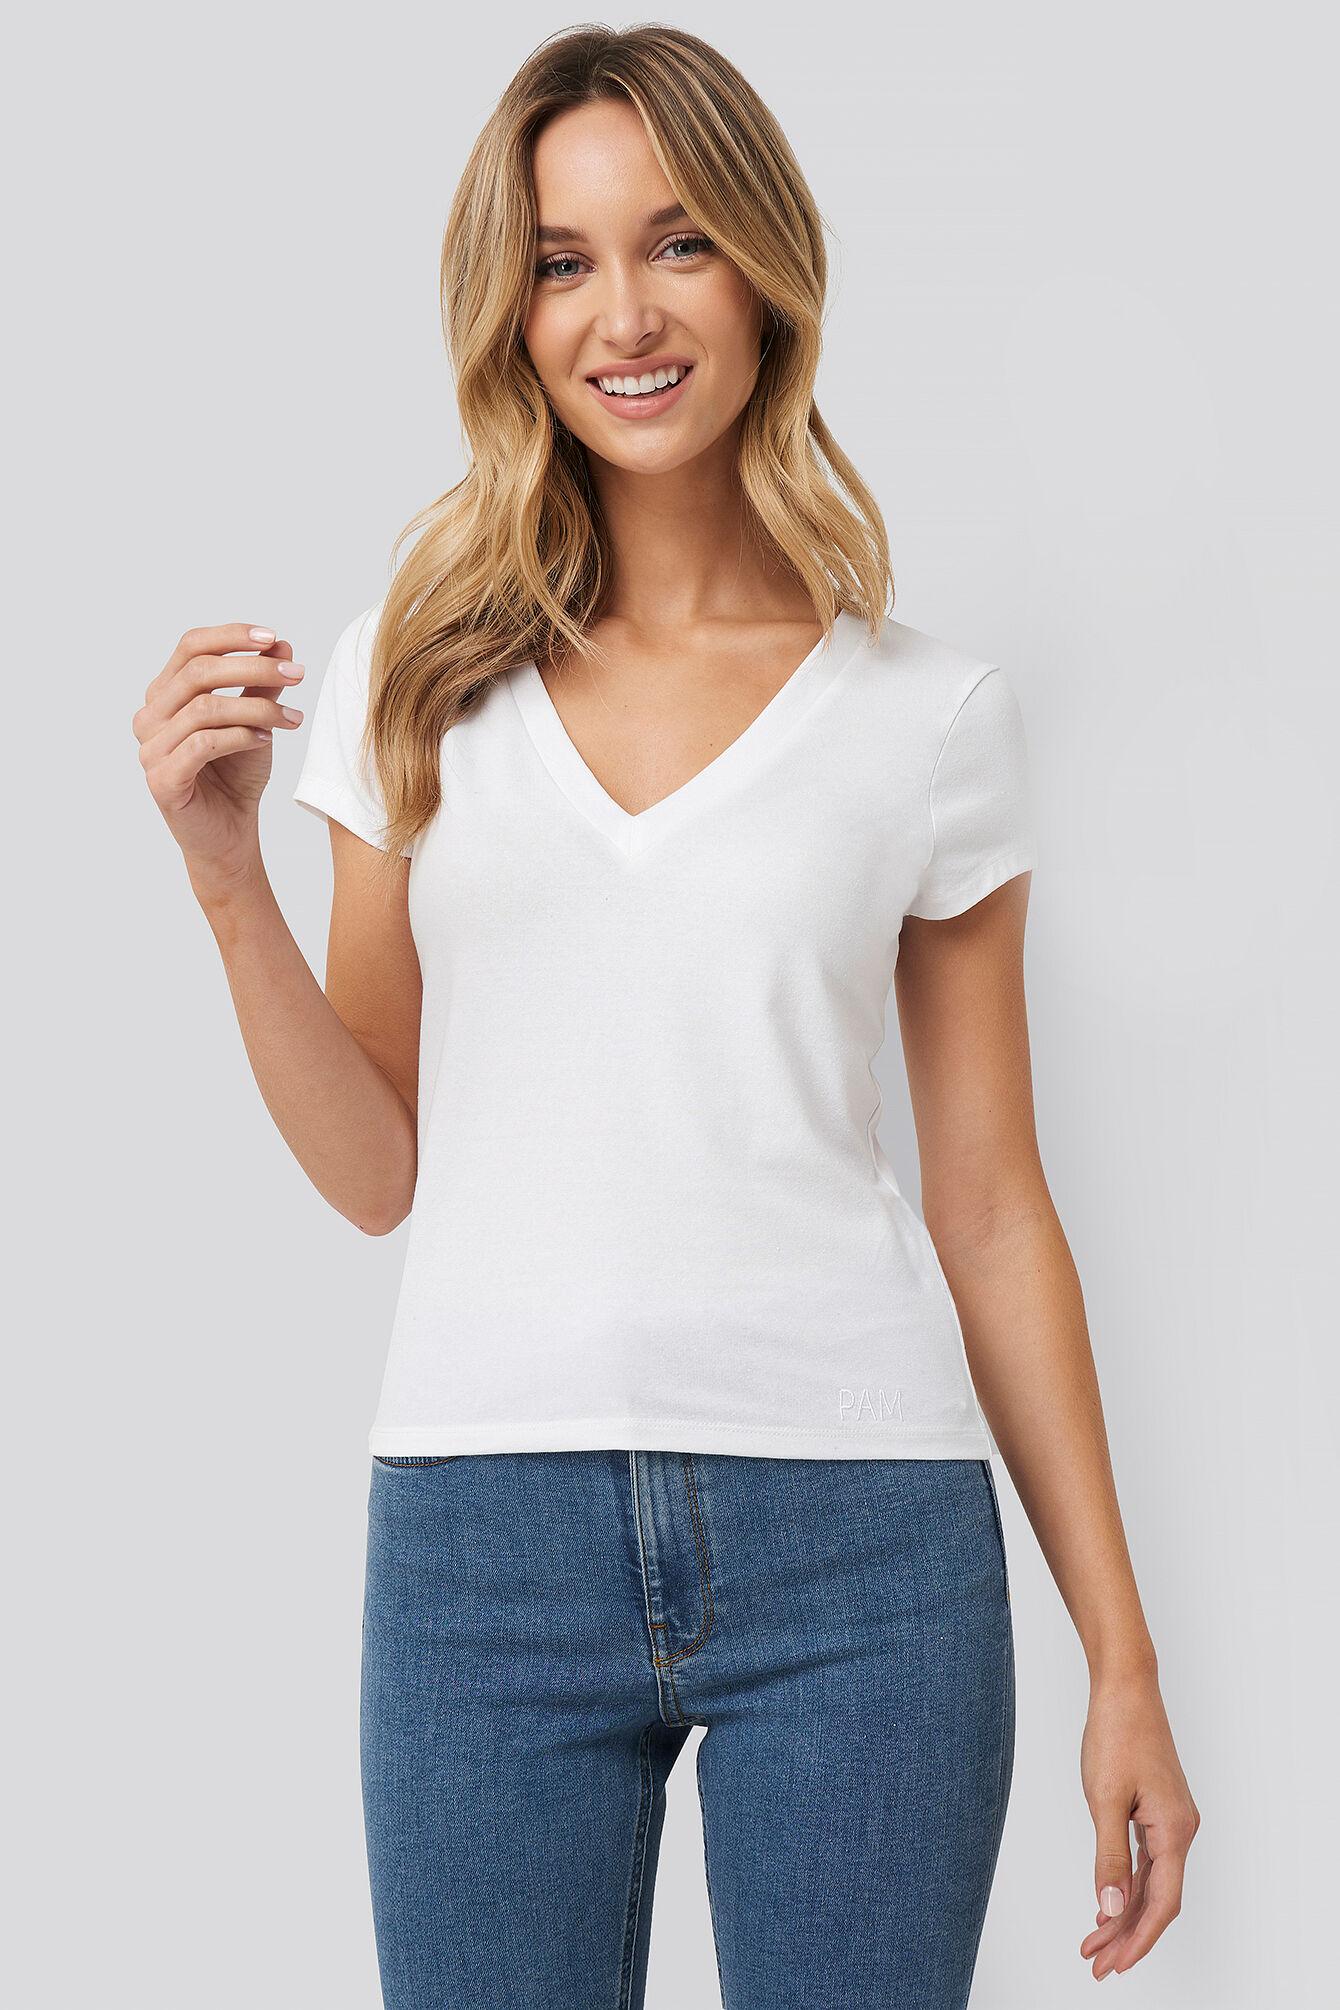 Pamela x NA-KD Reborn Deep V-Neck T-shirt - White  - Size: Small